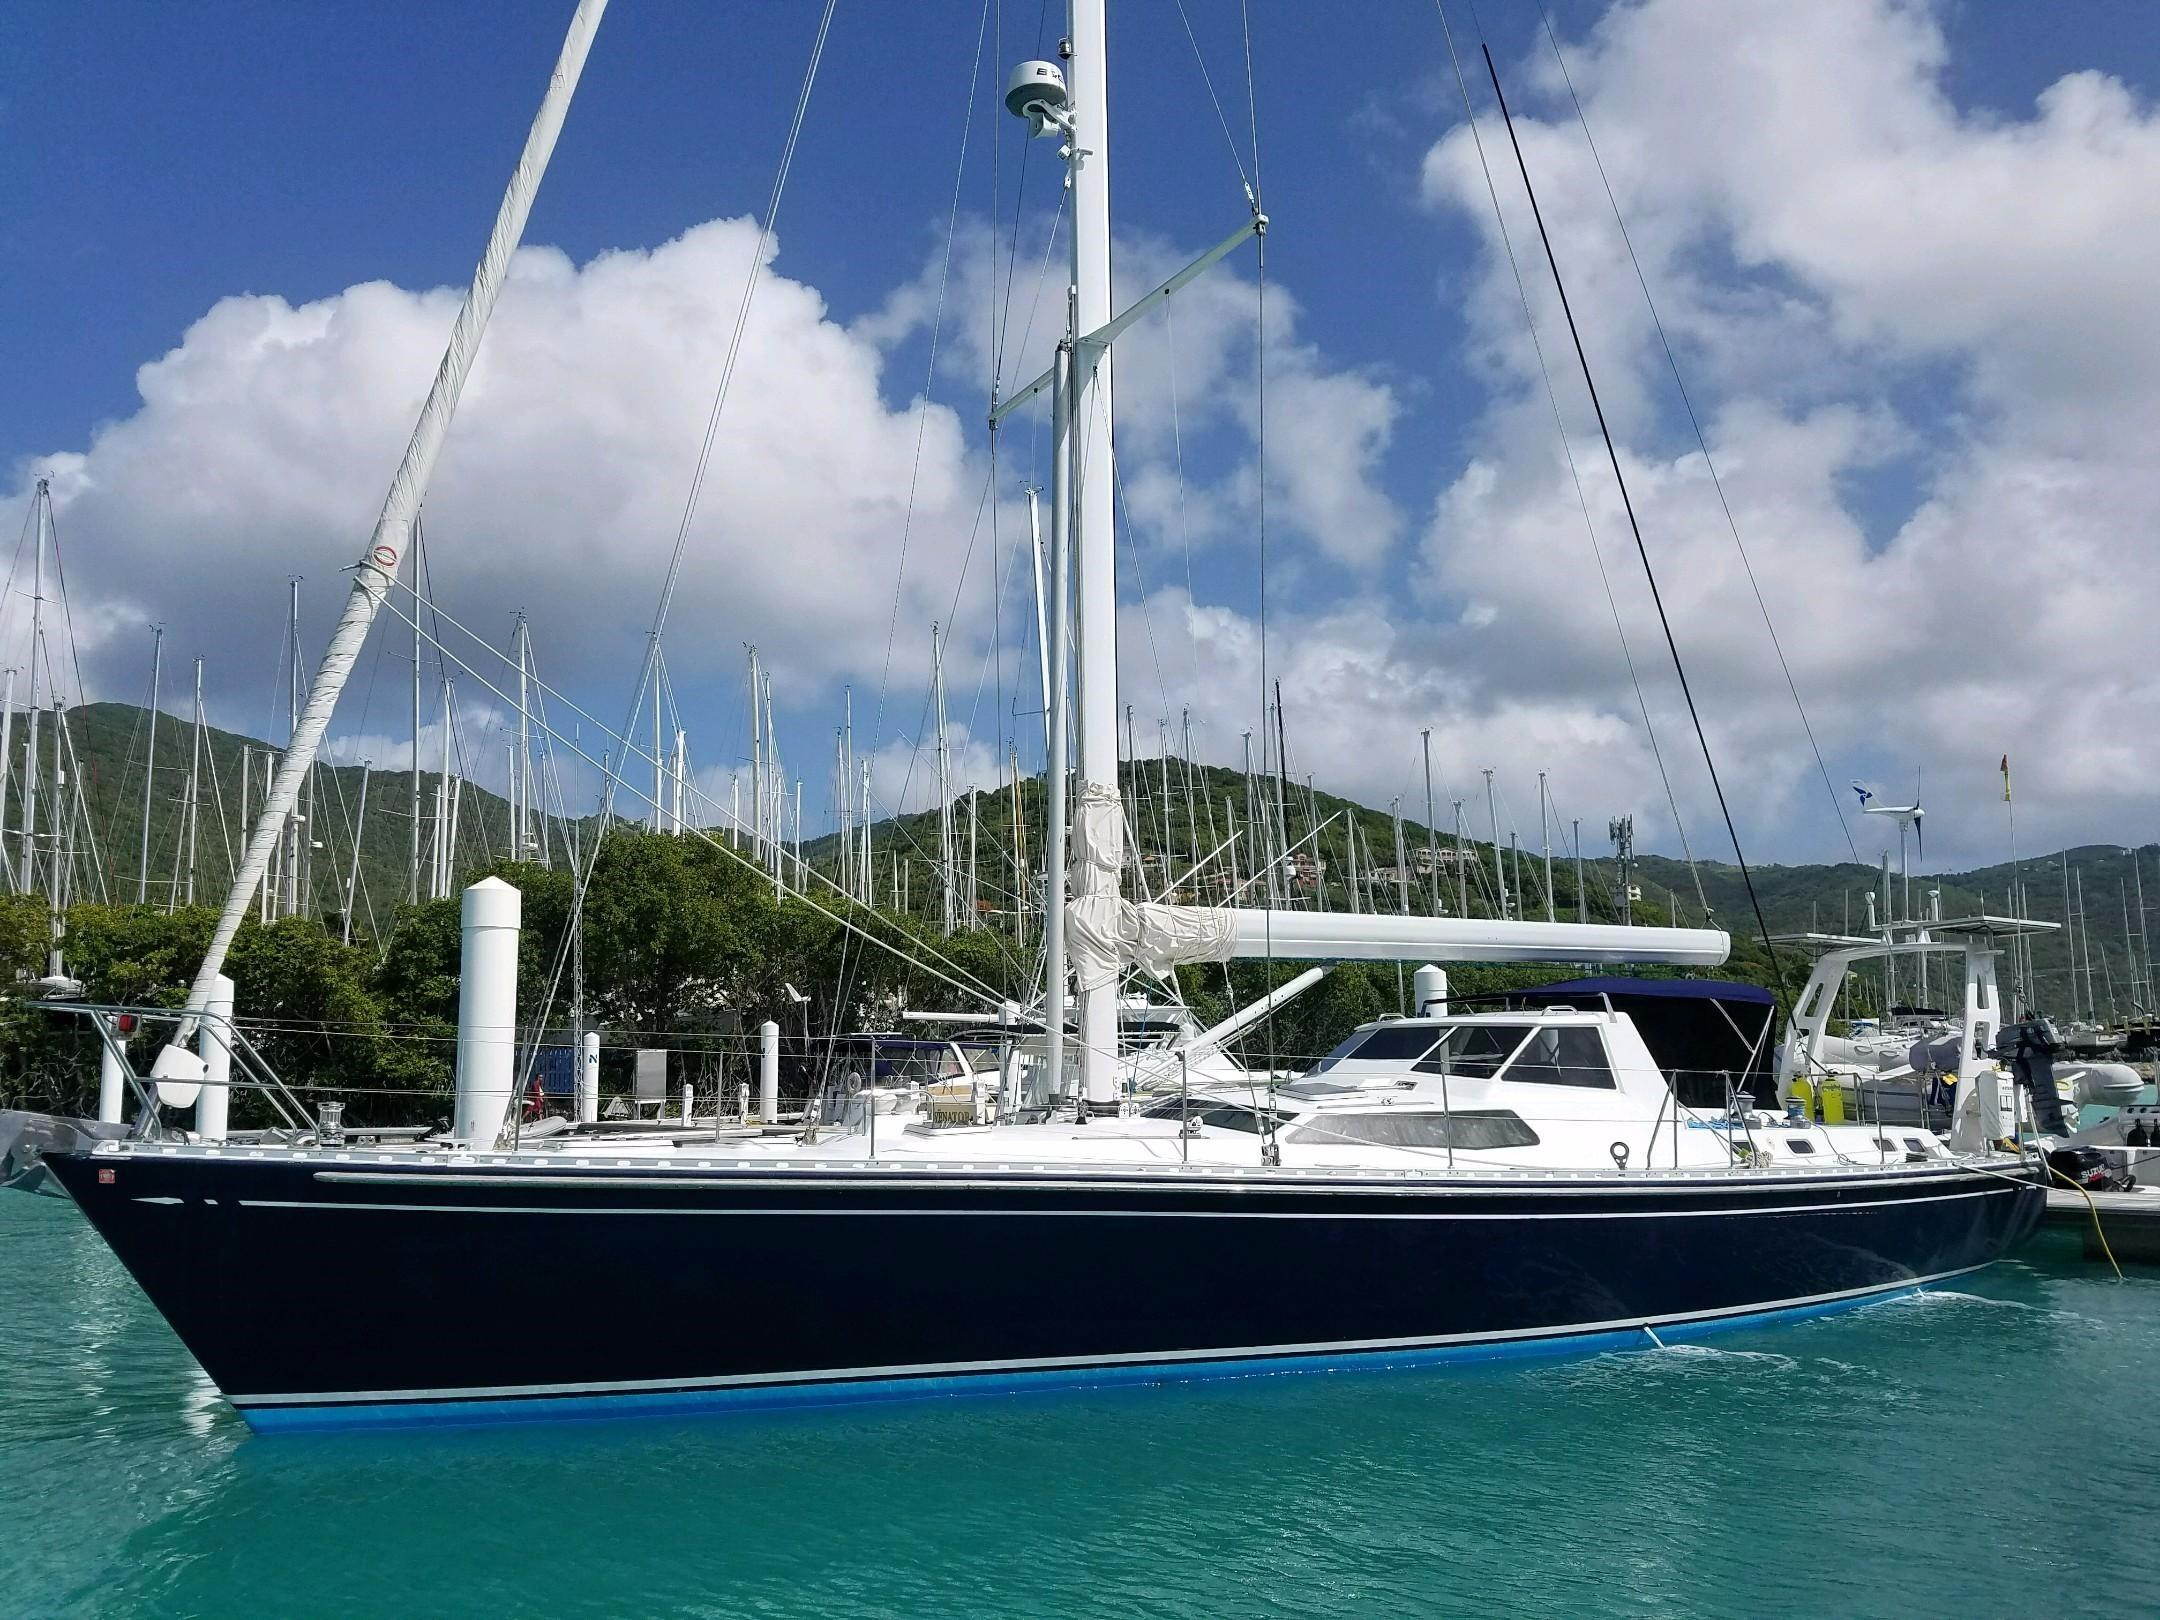 hight resolution of 2001 islander 56 sail boat for sale www yachtworld com